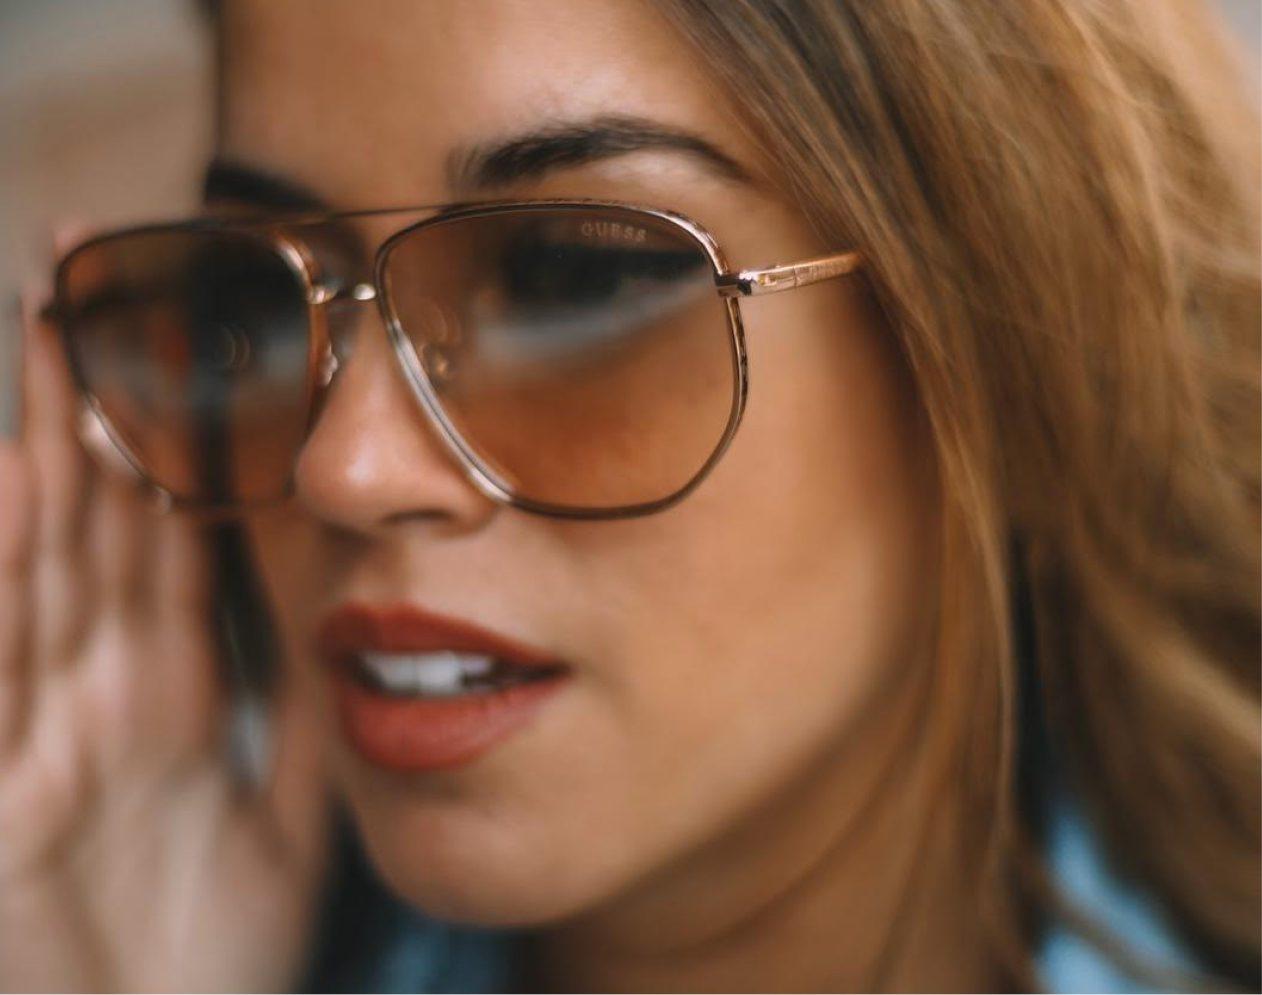 maria GUESS eyewear woman glasses